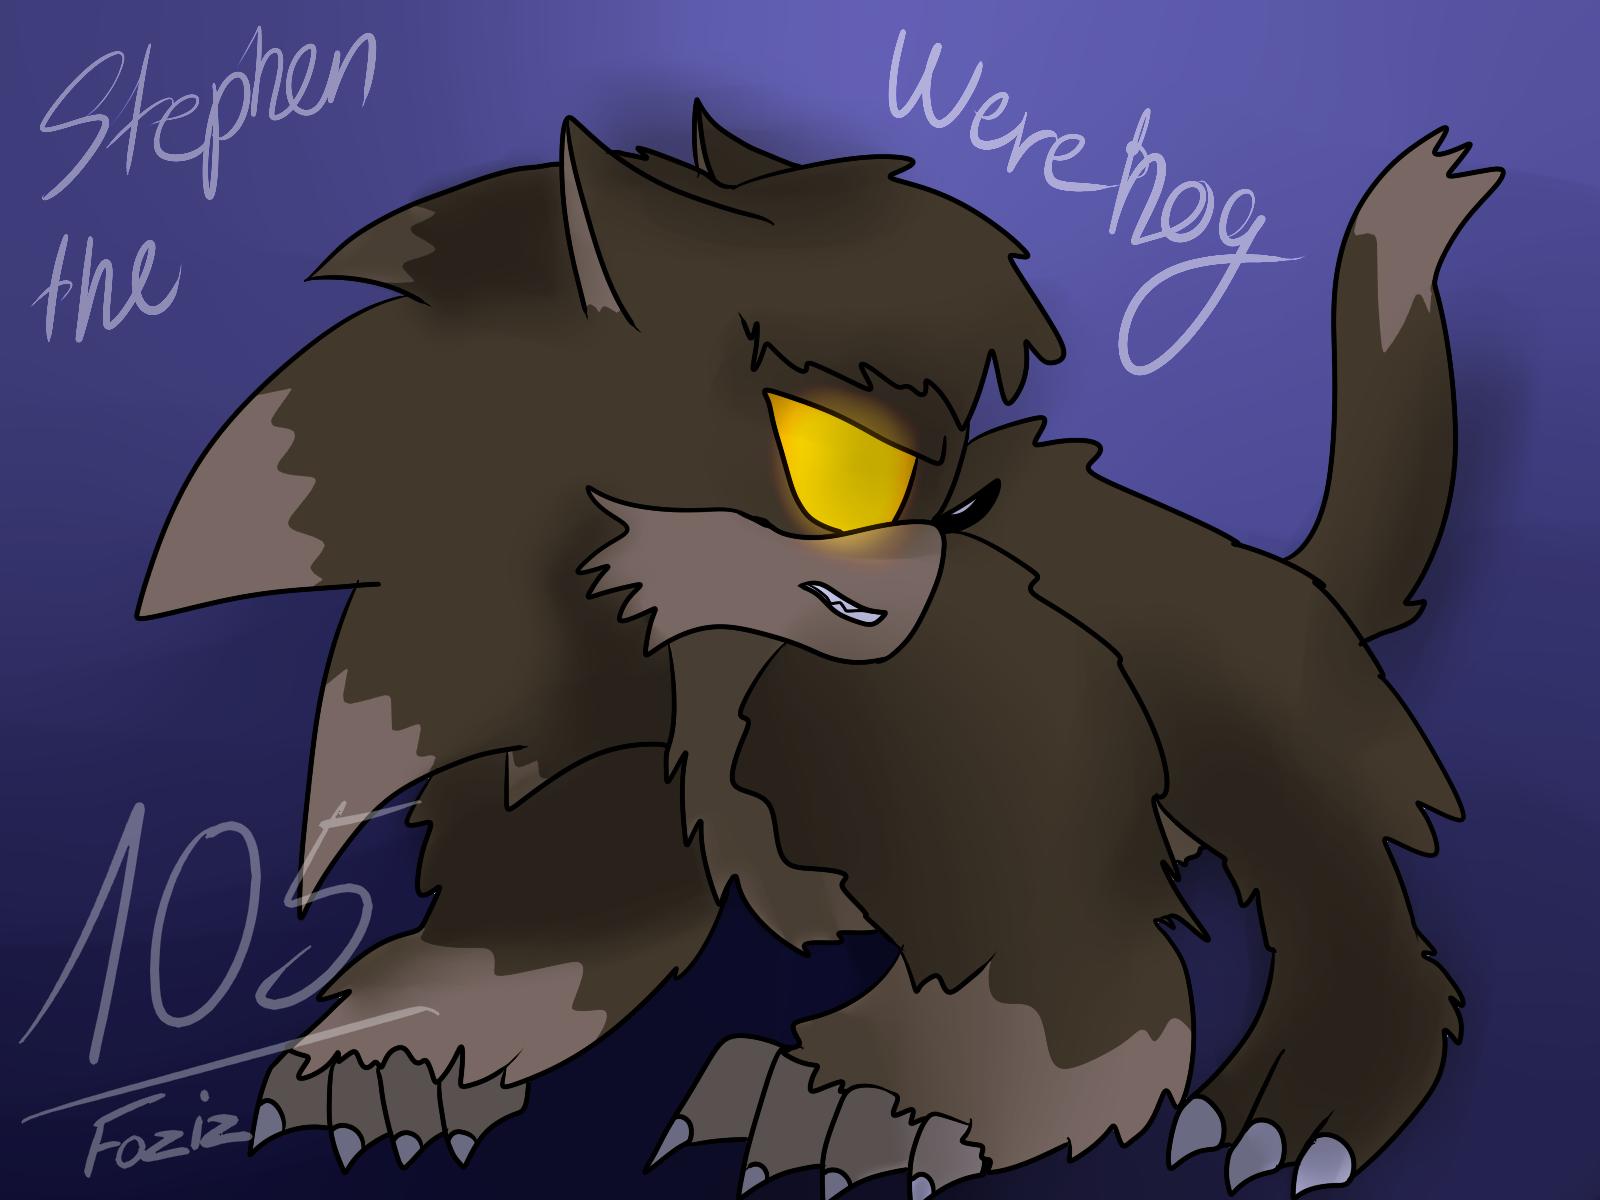 (Commission) Stephen the werehog by Foziz105